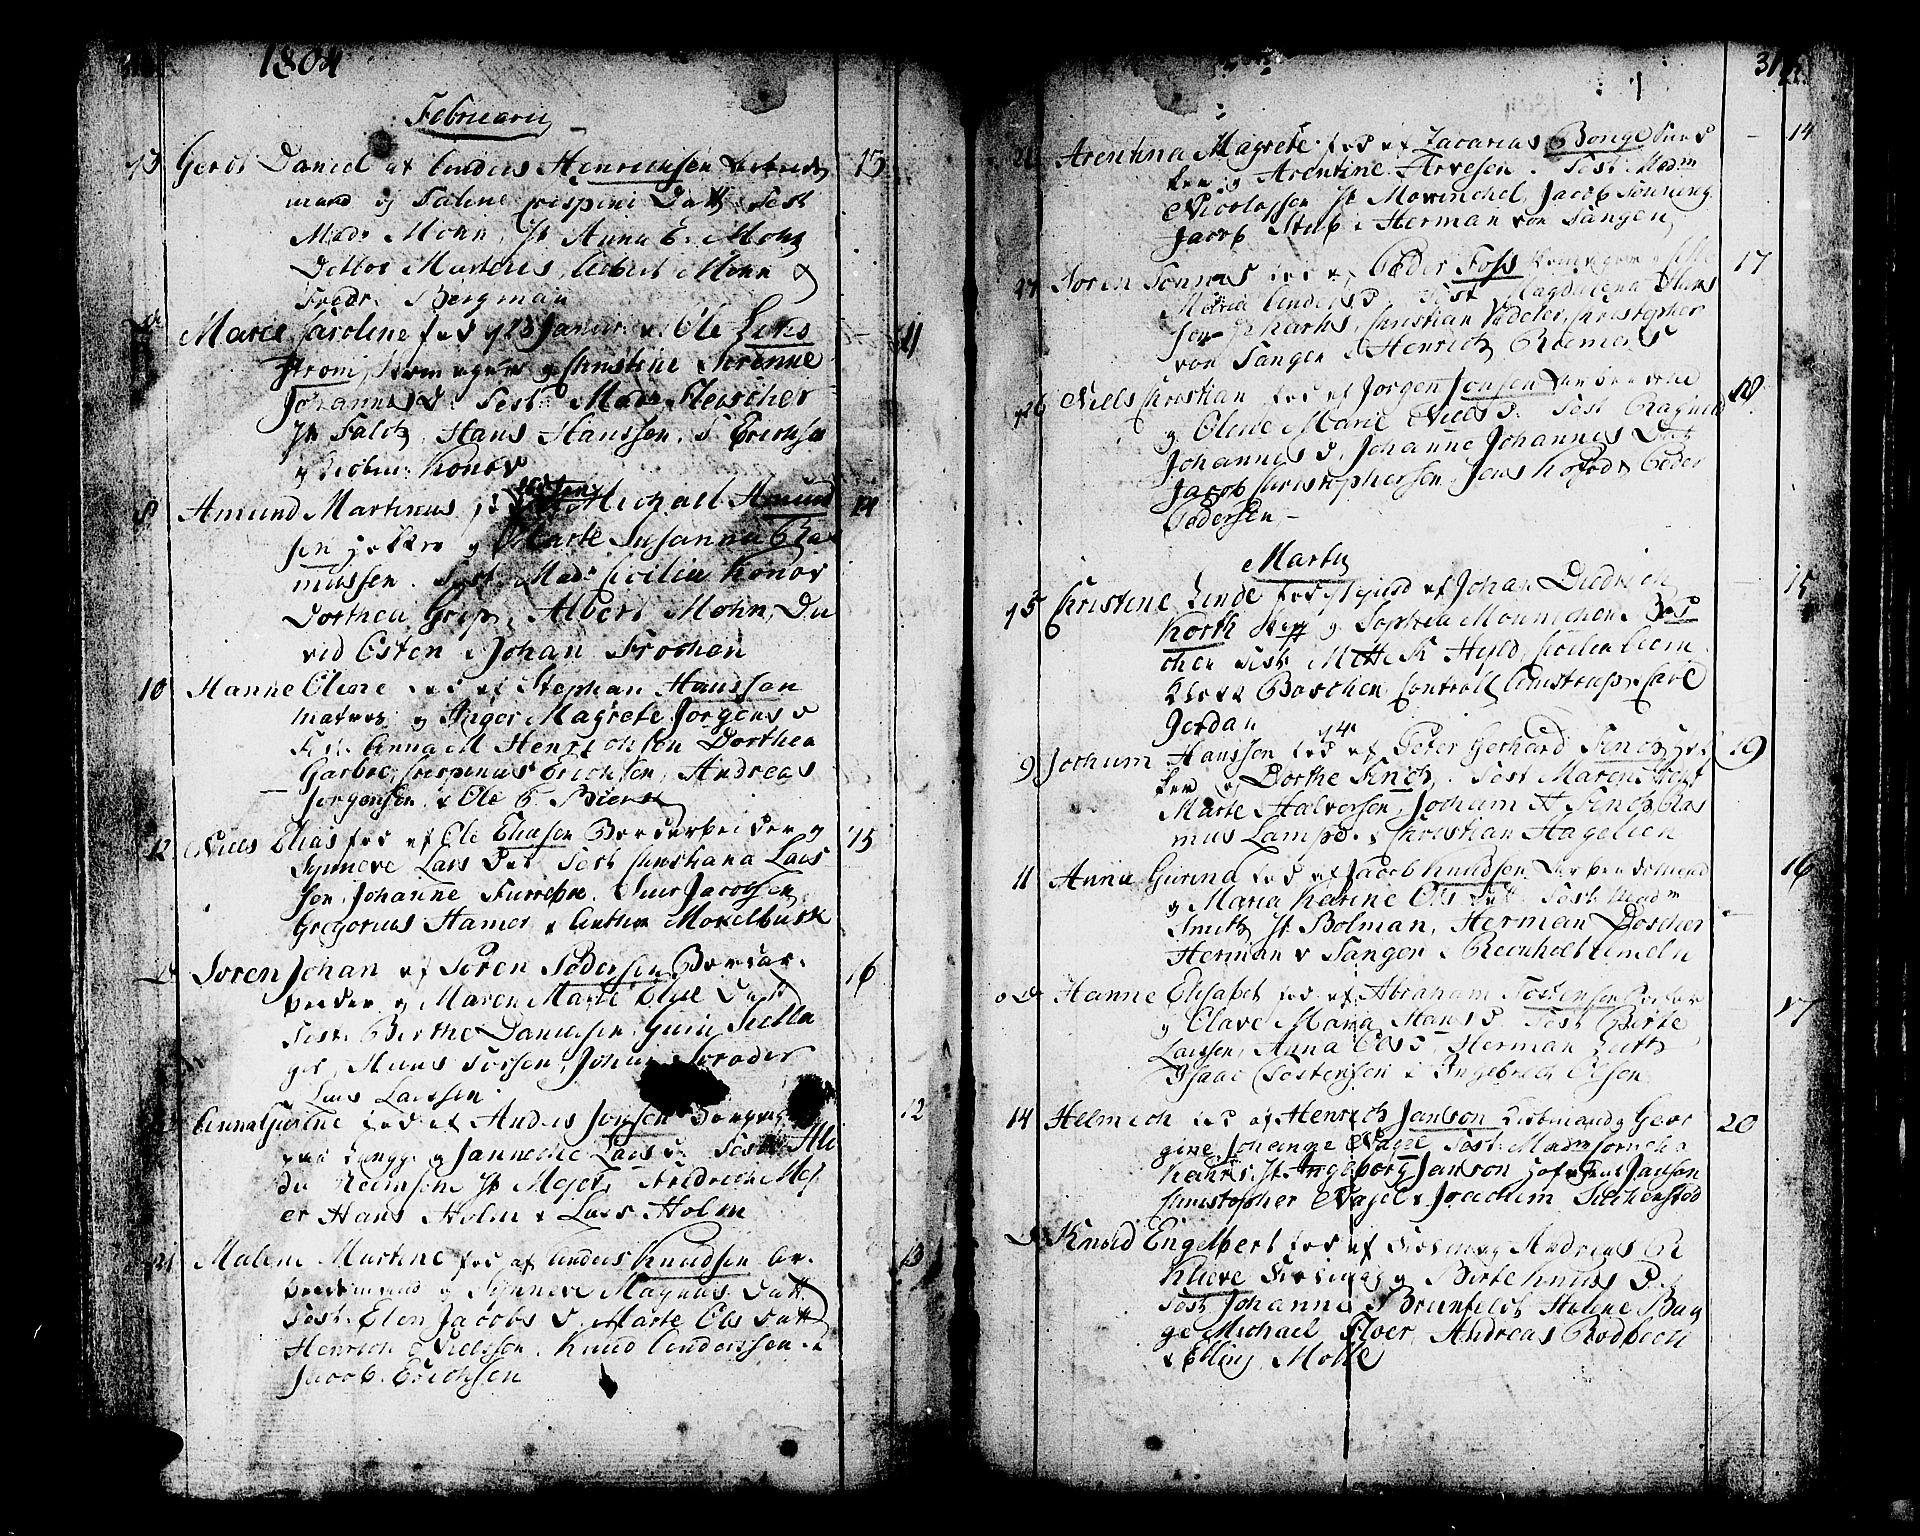 SAB, Domkirken sokneprestembete, H/Haa/L0004: Ministerialbok nr. A 4, 1763-1820, s. 316-317